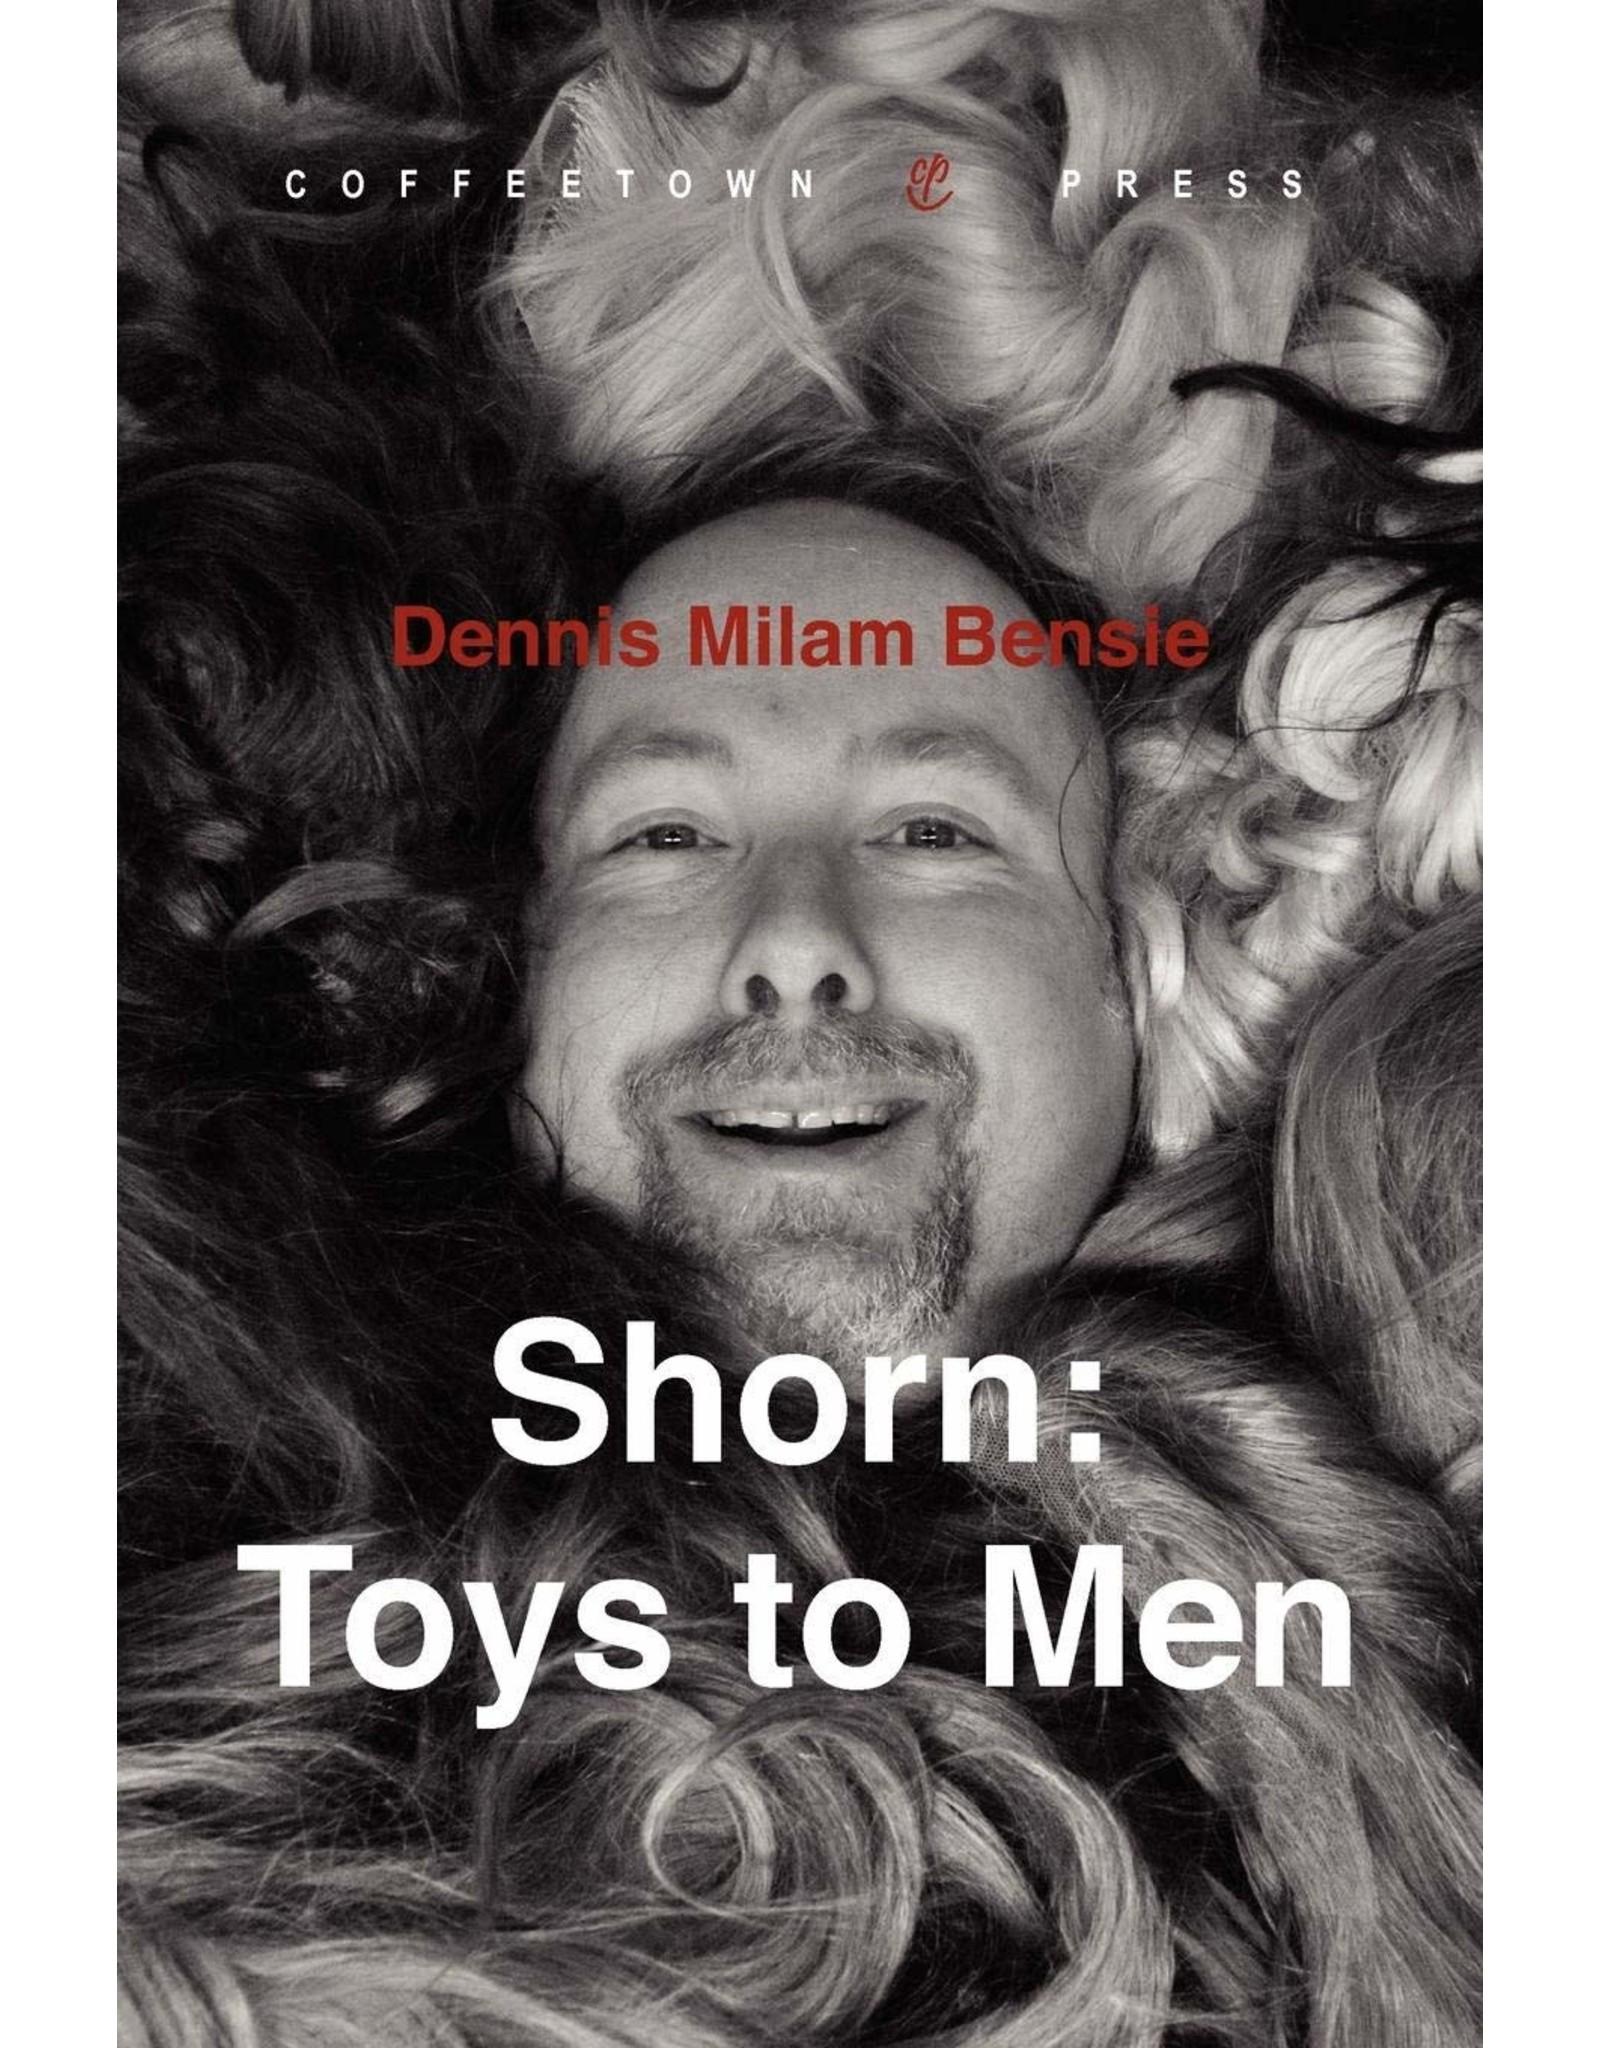 Independent Independent Brand Shorn: Toys to Men By Dennis Milam Bensie